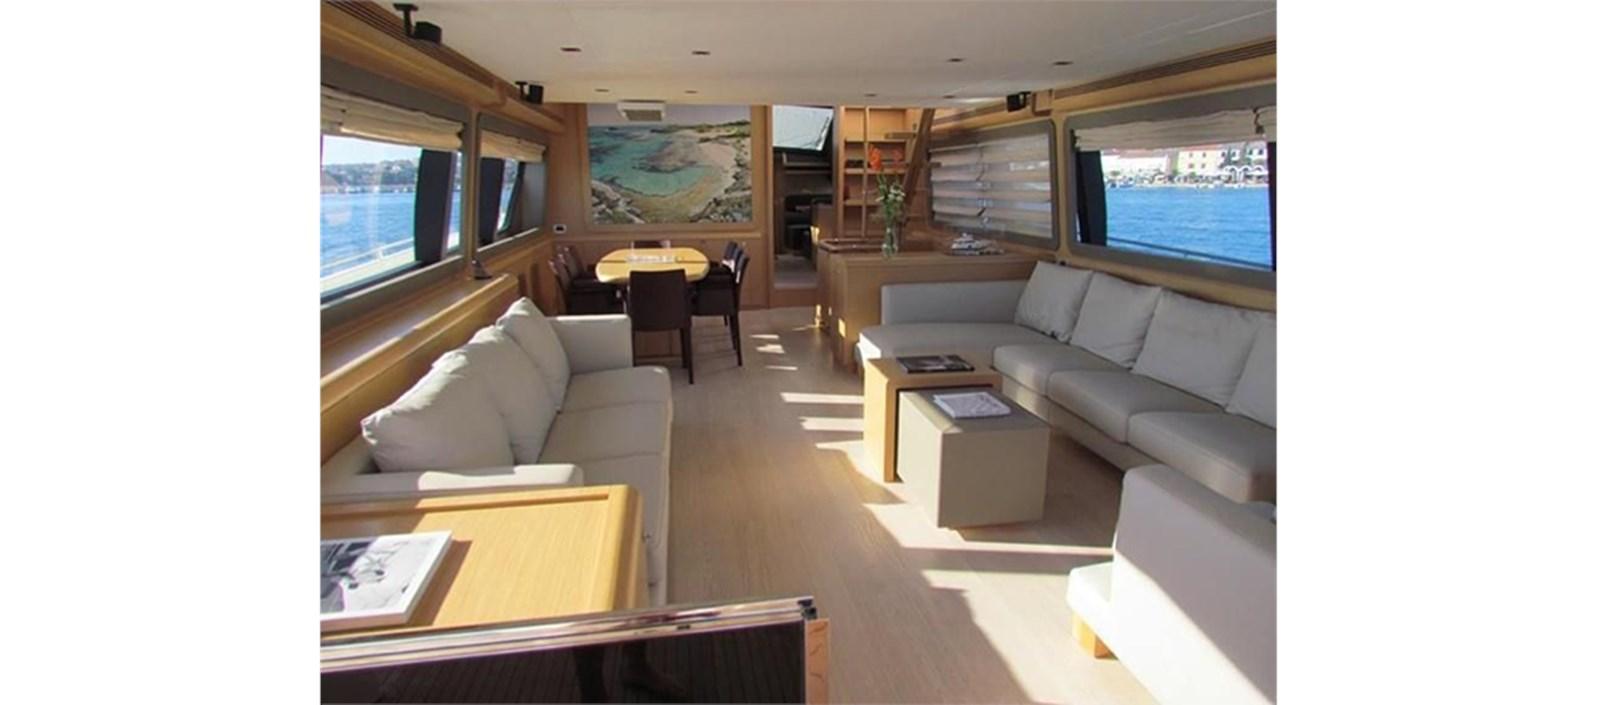 LA STELLA yacht for sale